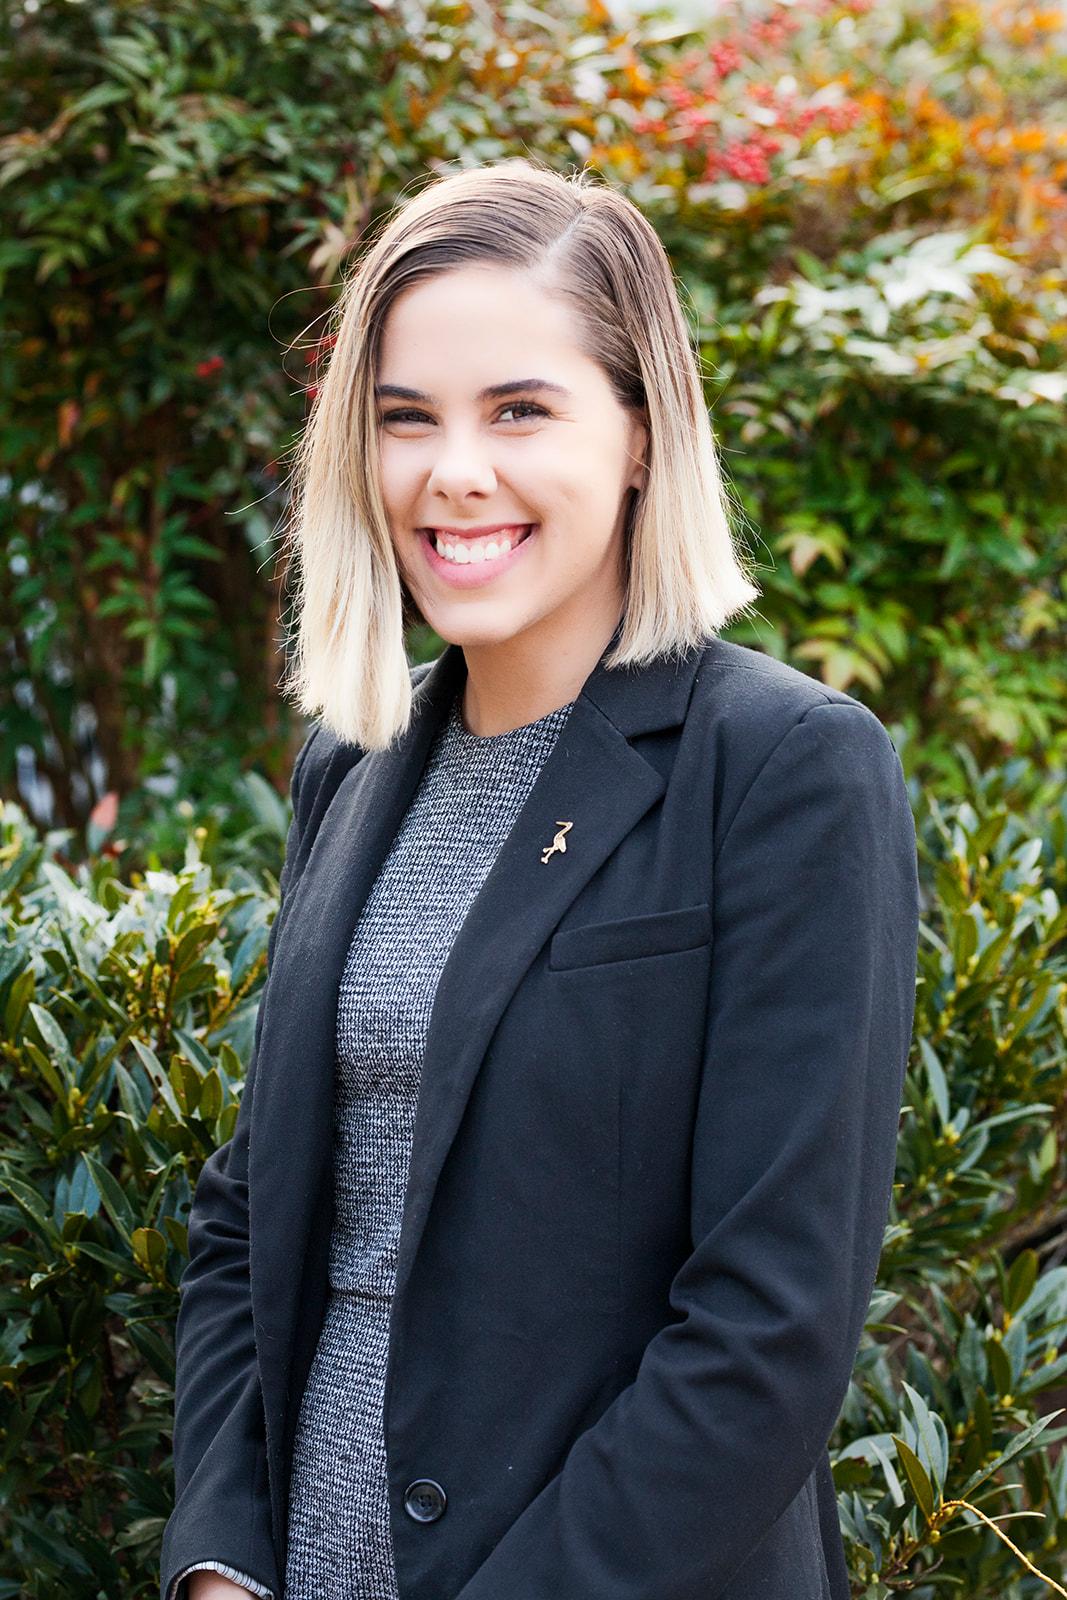 Chelsea Hogan, Funeral Service Intern - Storke Funeral Home